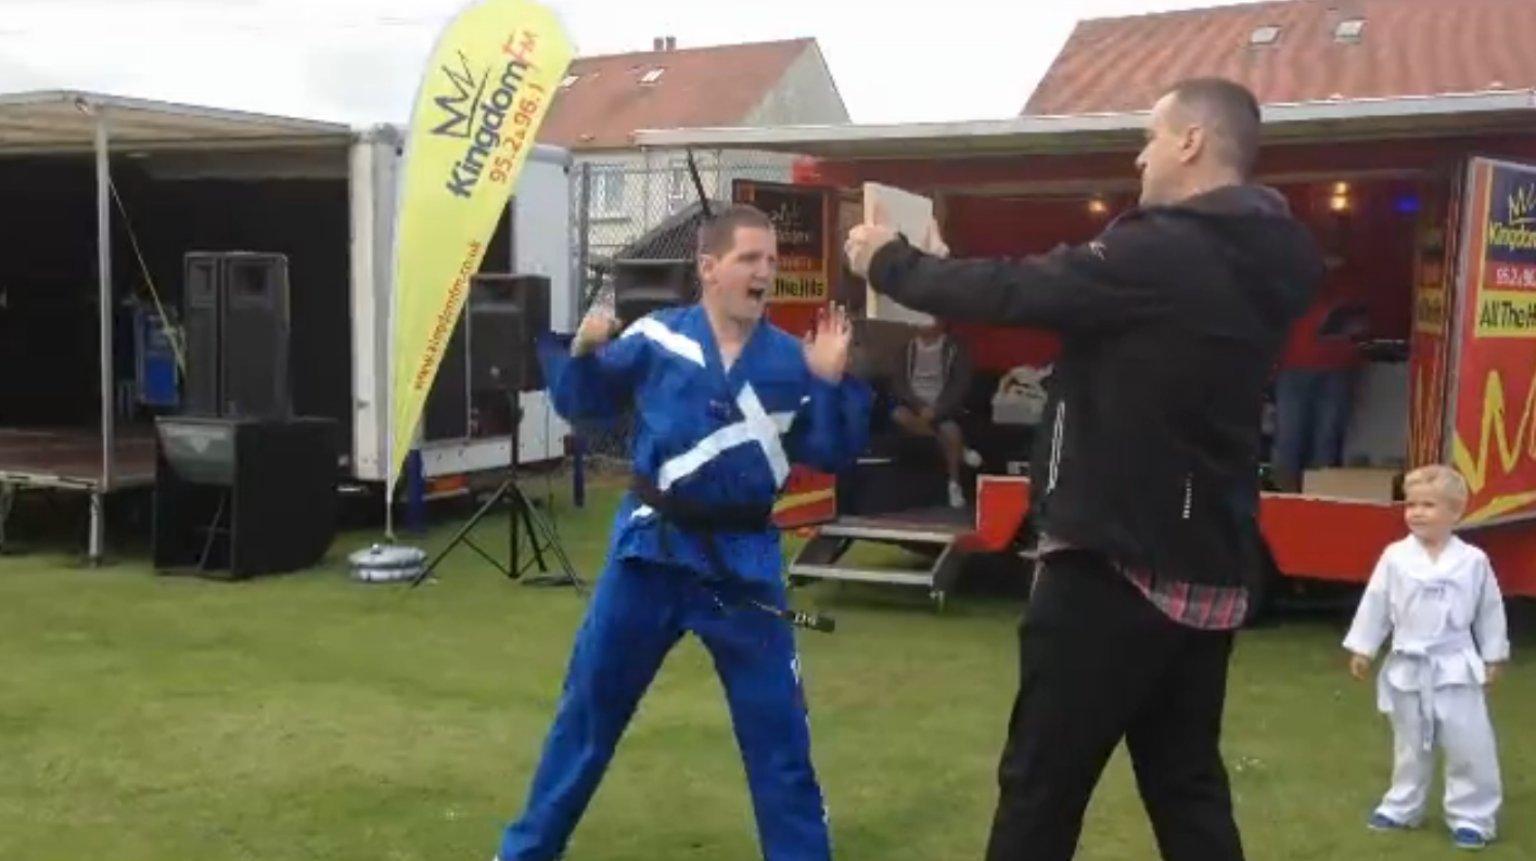 Taekwondo - Summer Olympic Sport